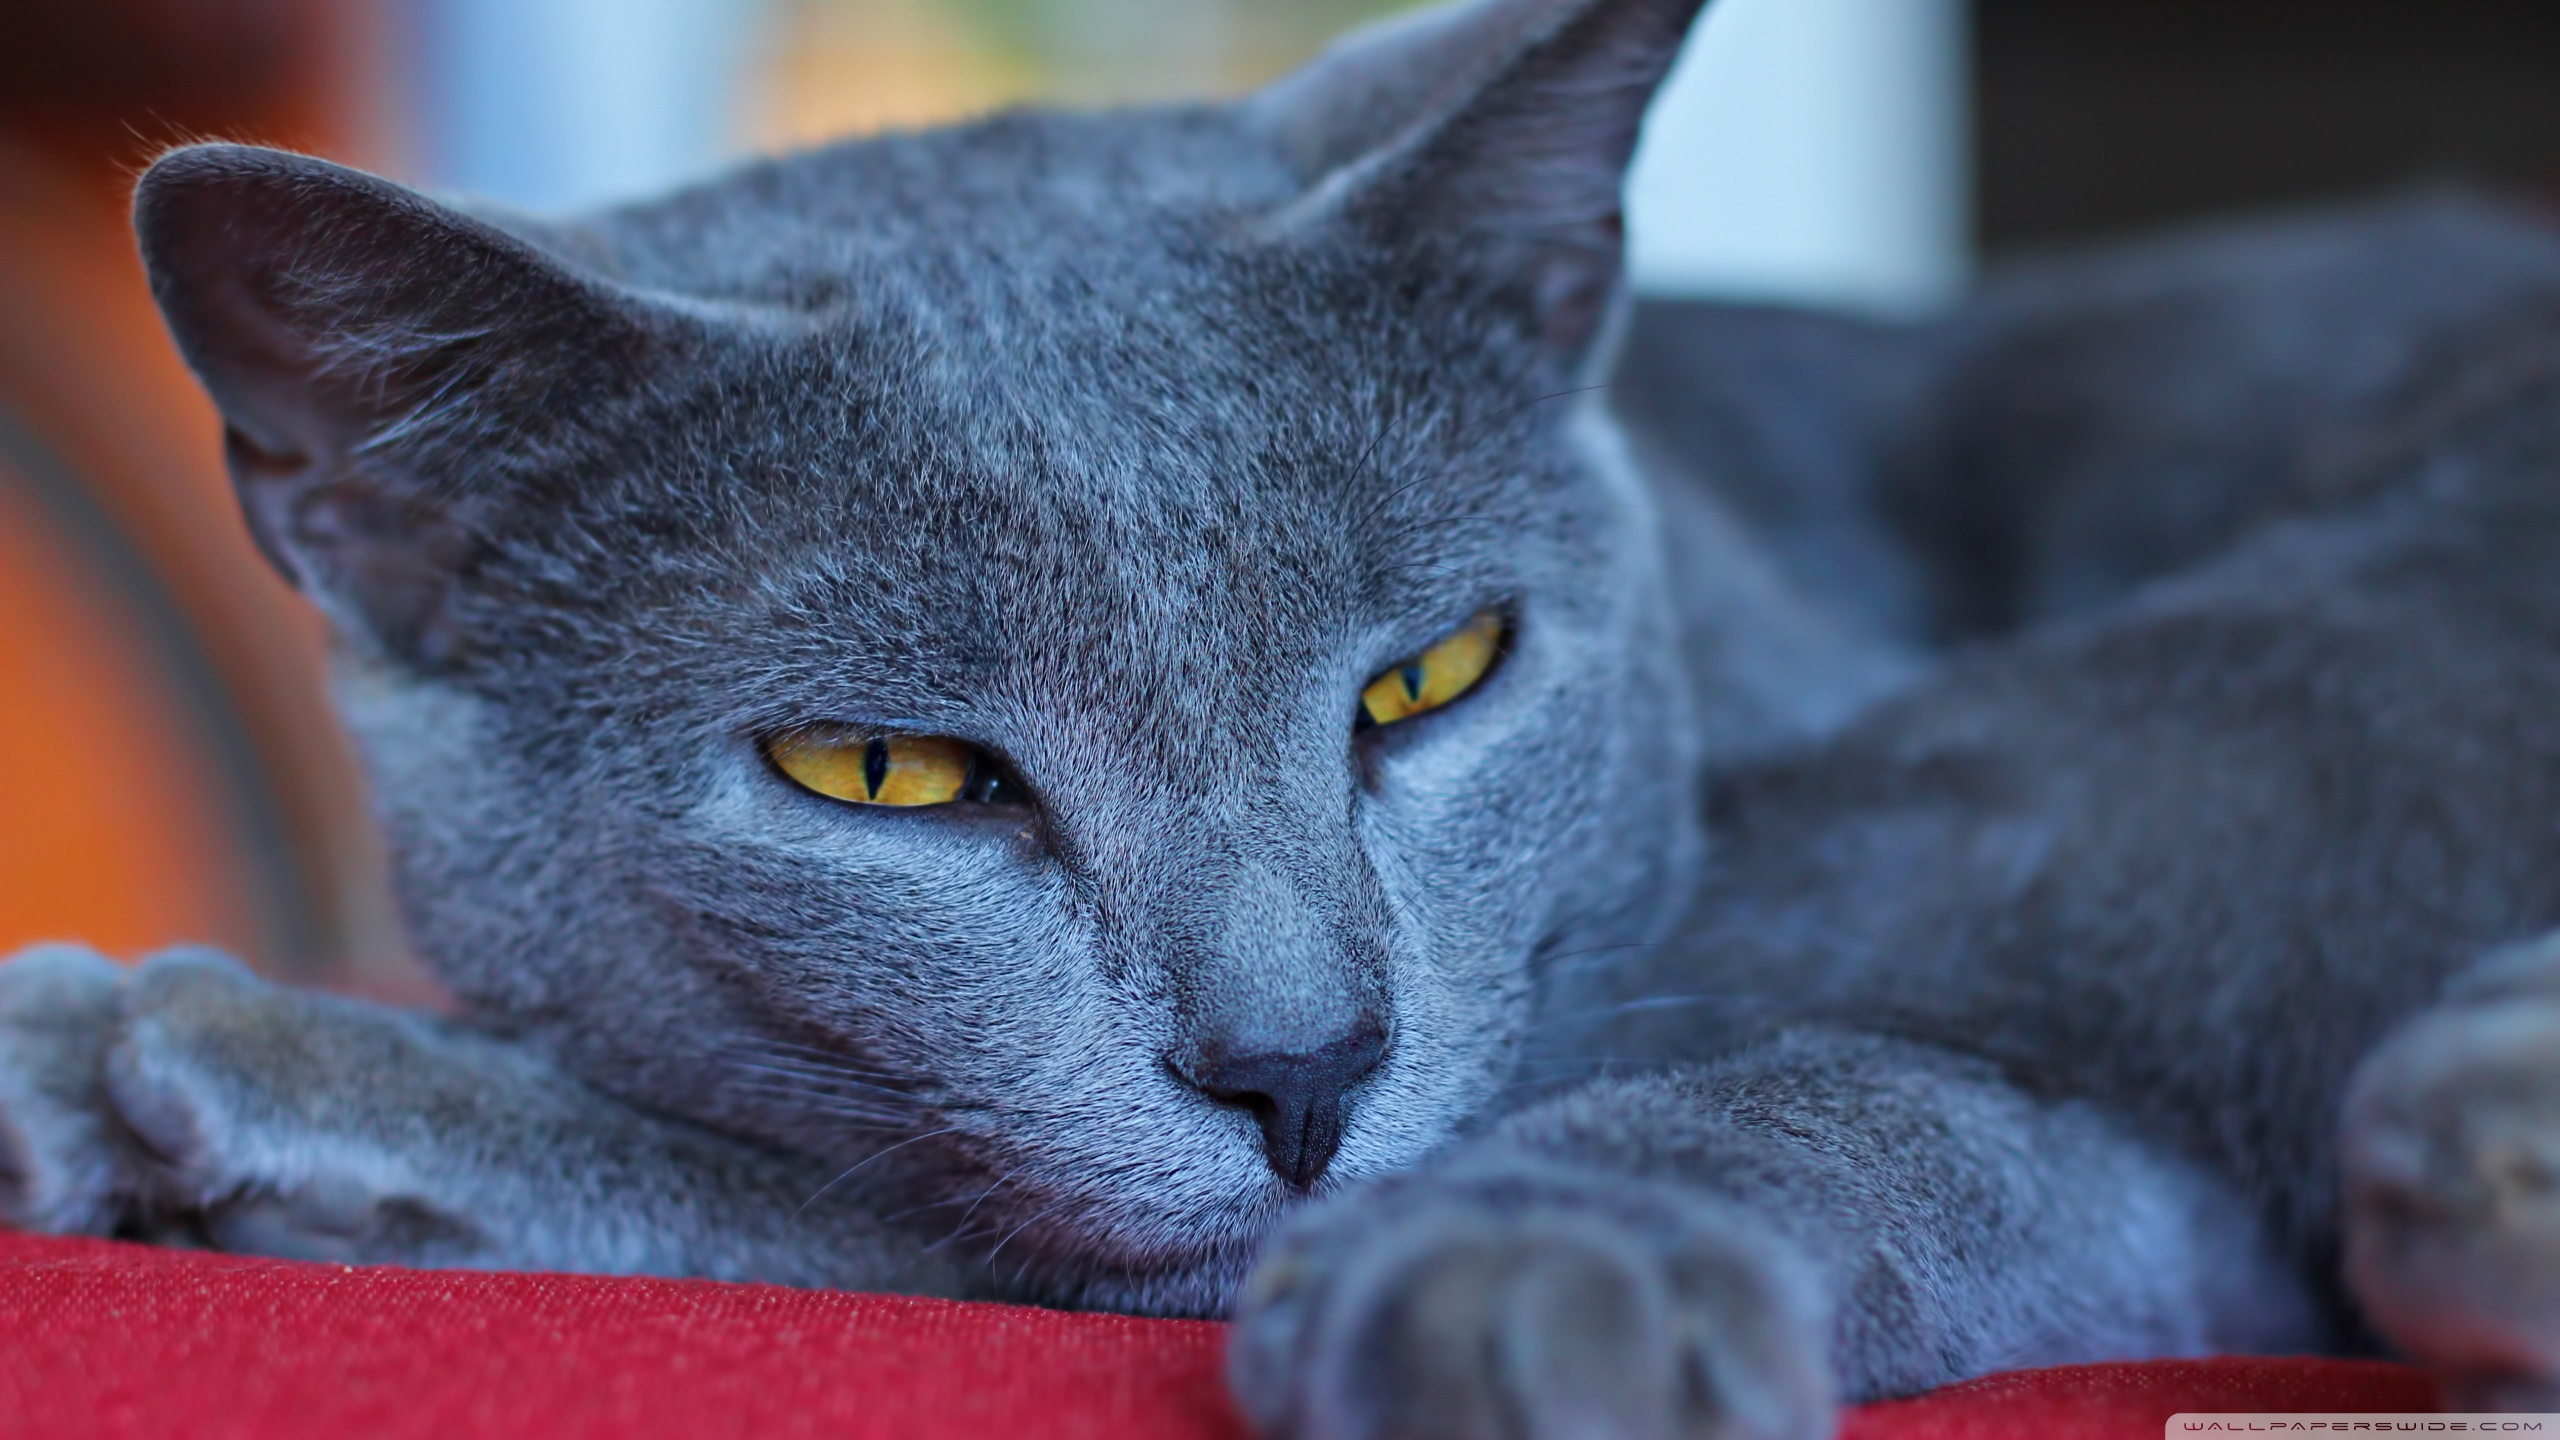 Korn Ja Cat: Korn Kindly Chartreux Face Breed